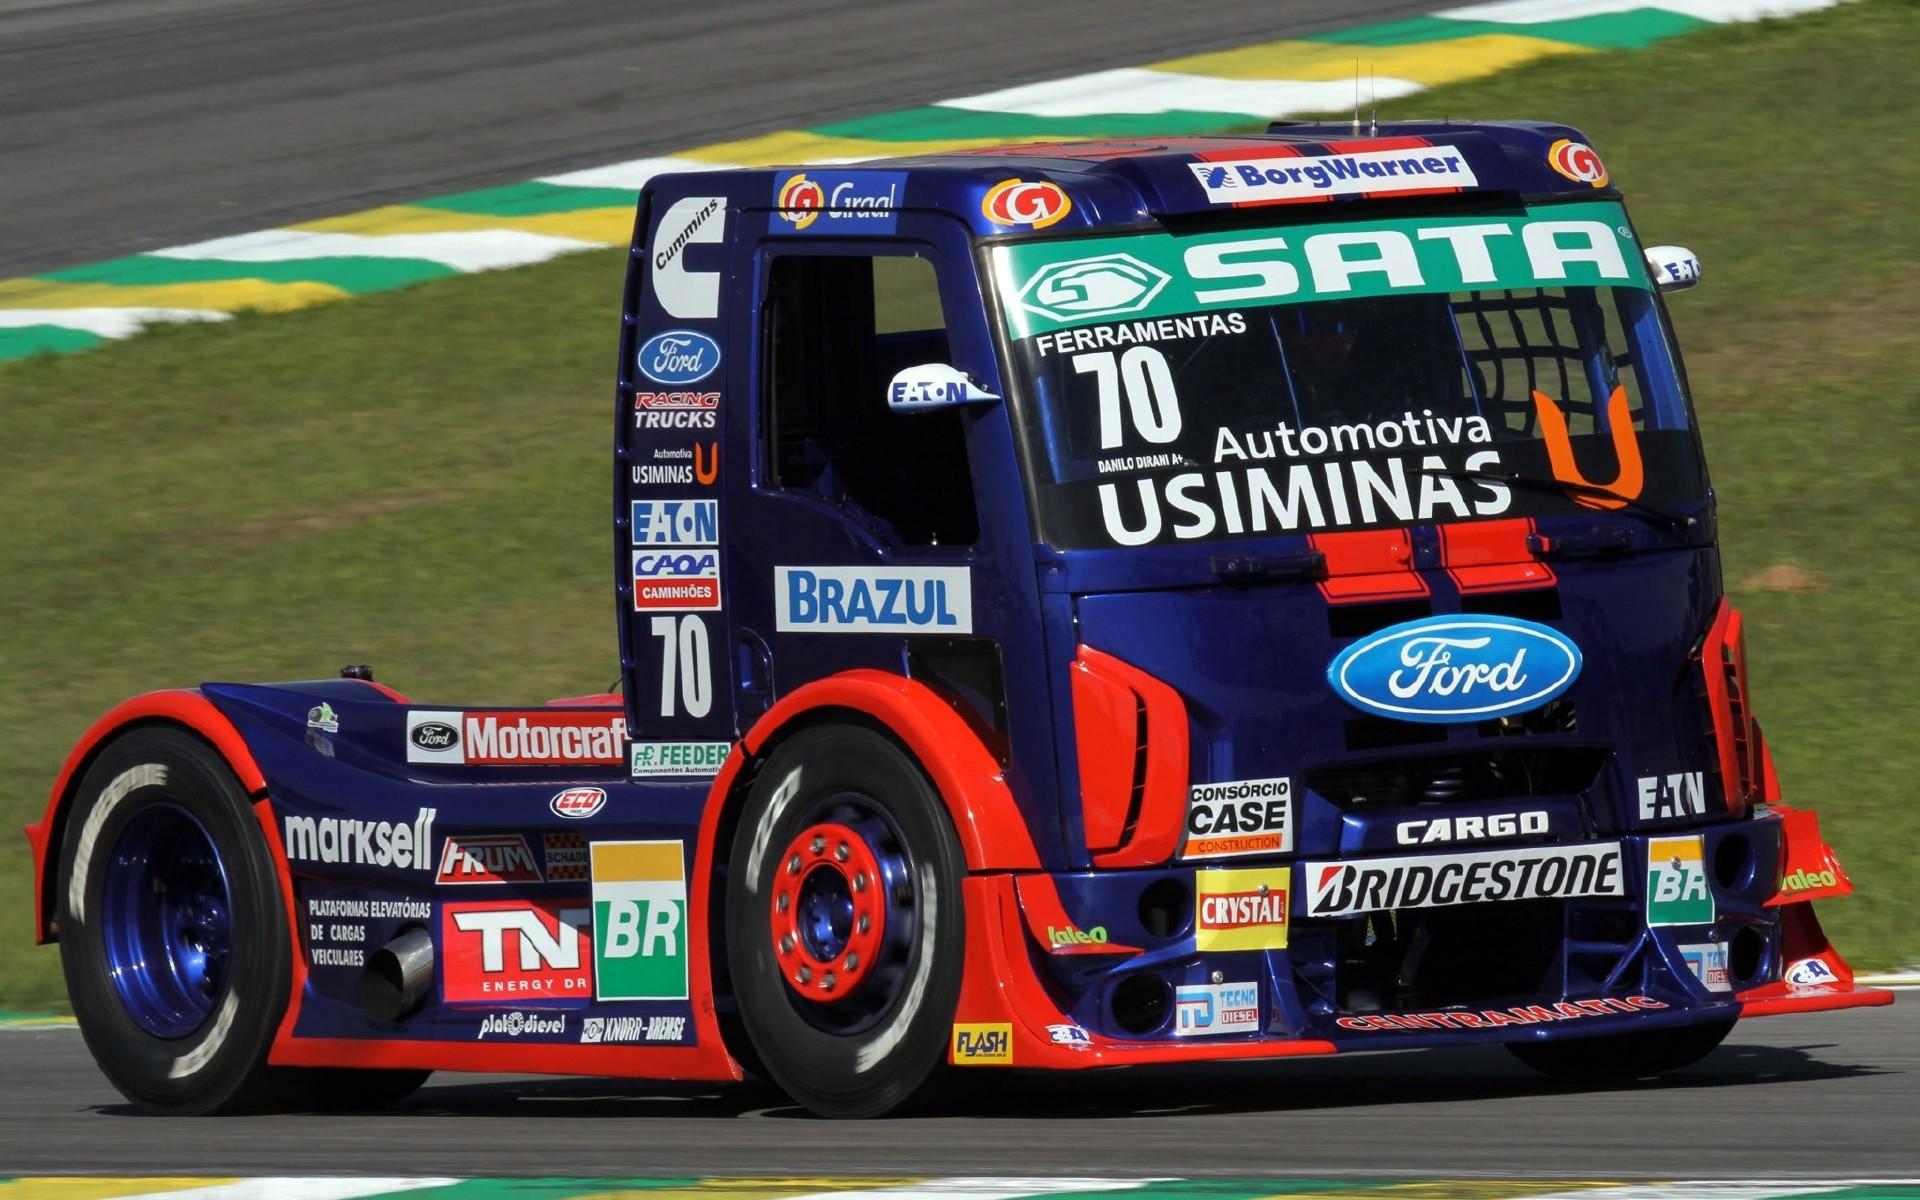 Semi Truck Racing | FORD CARGO FORMULA TRUCK RACE RACING SEMI TRUCTOR. —  Wallpaper .